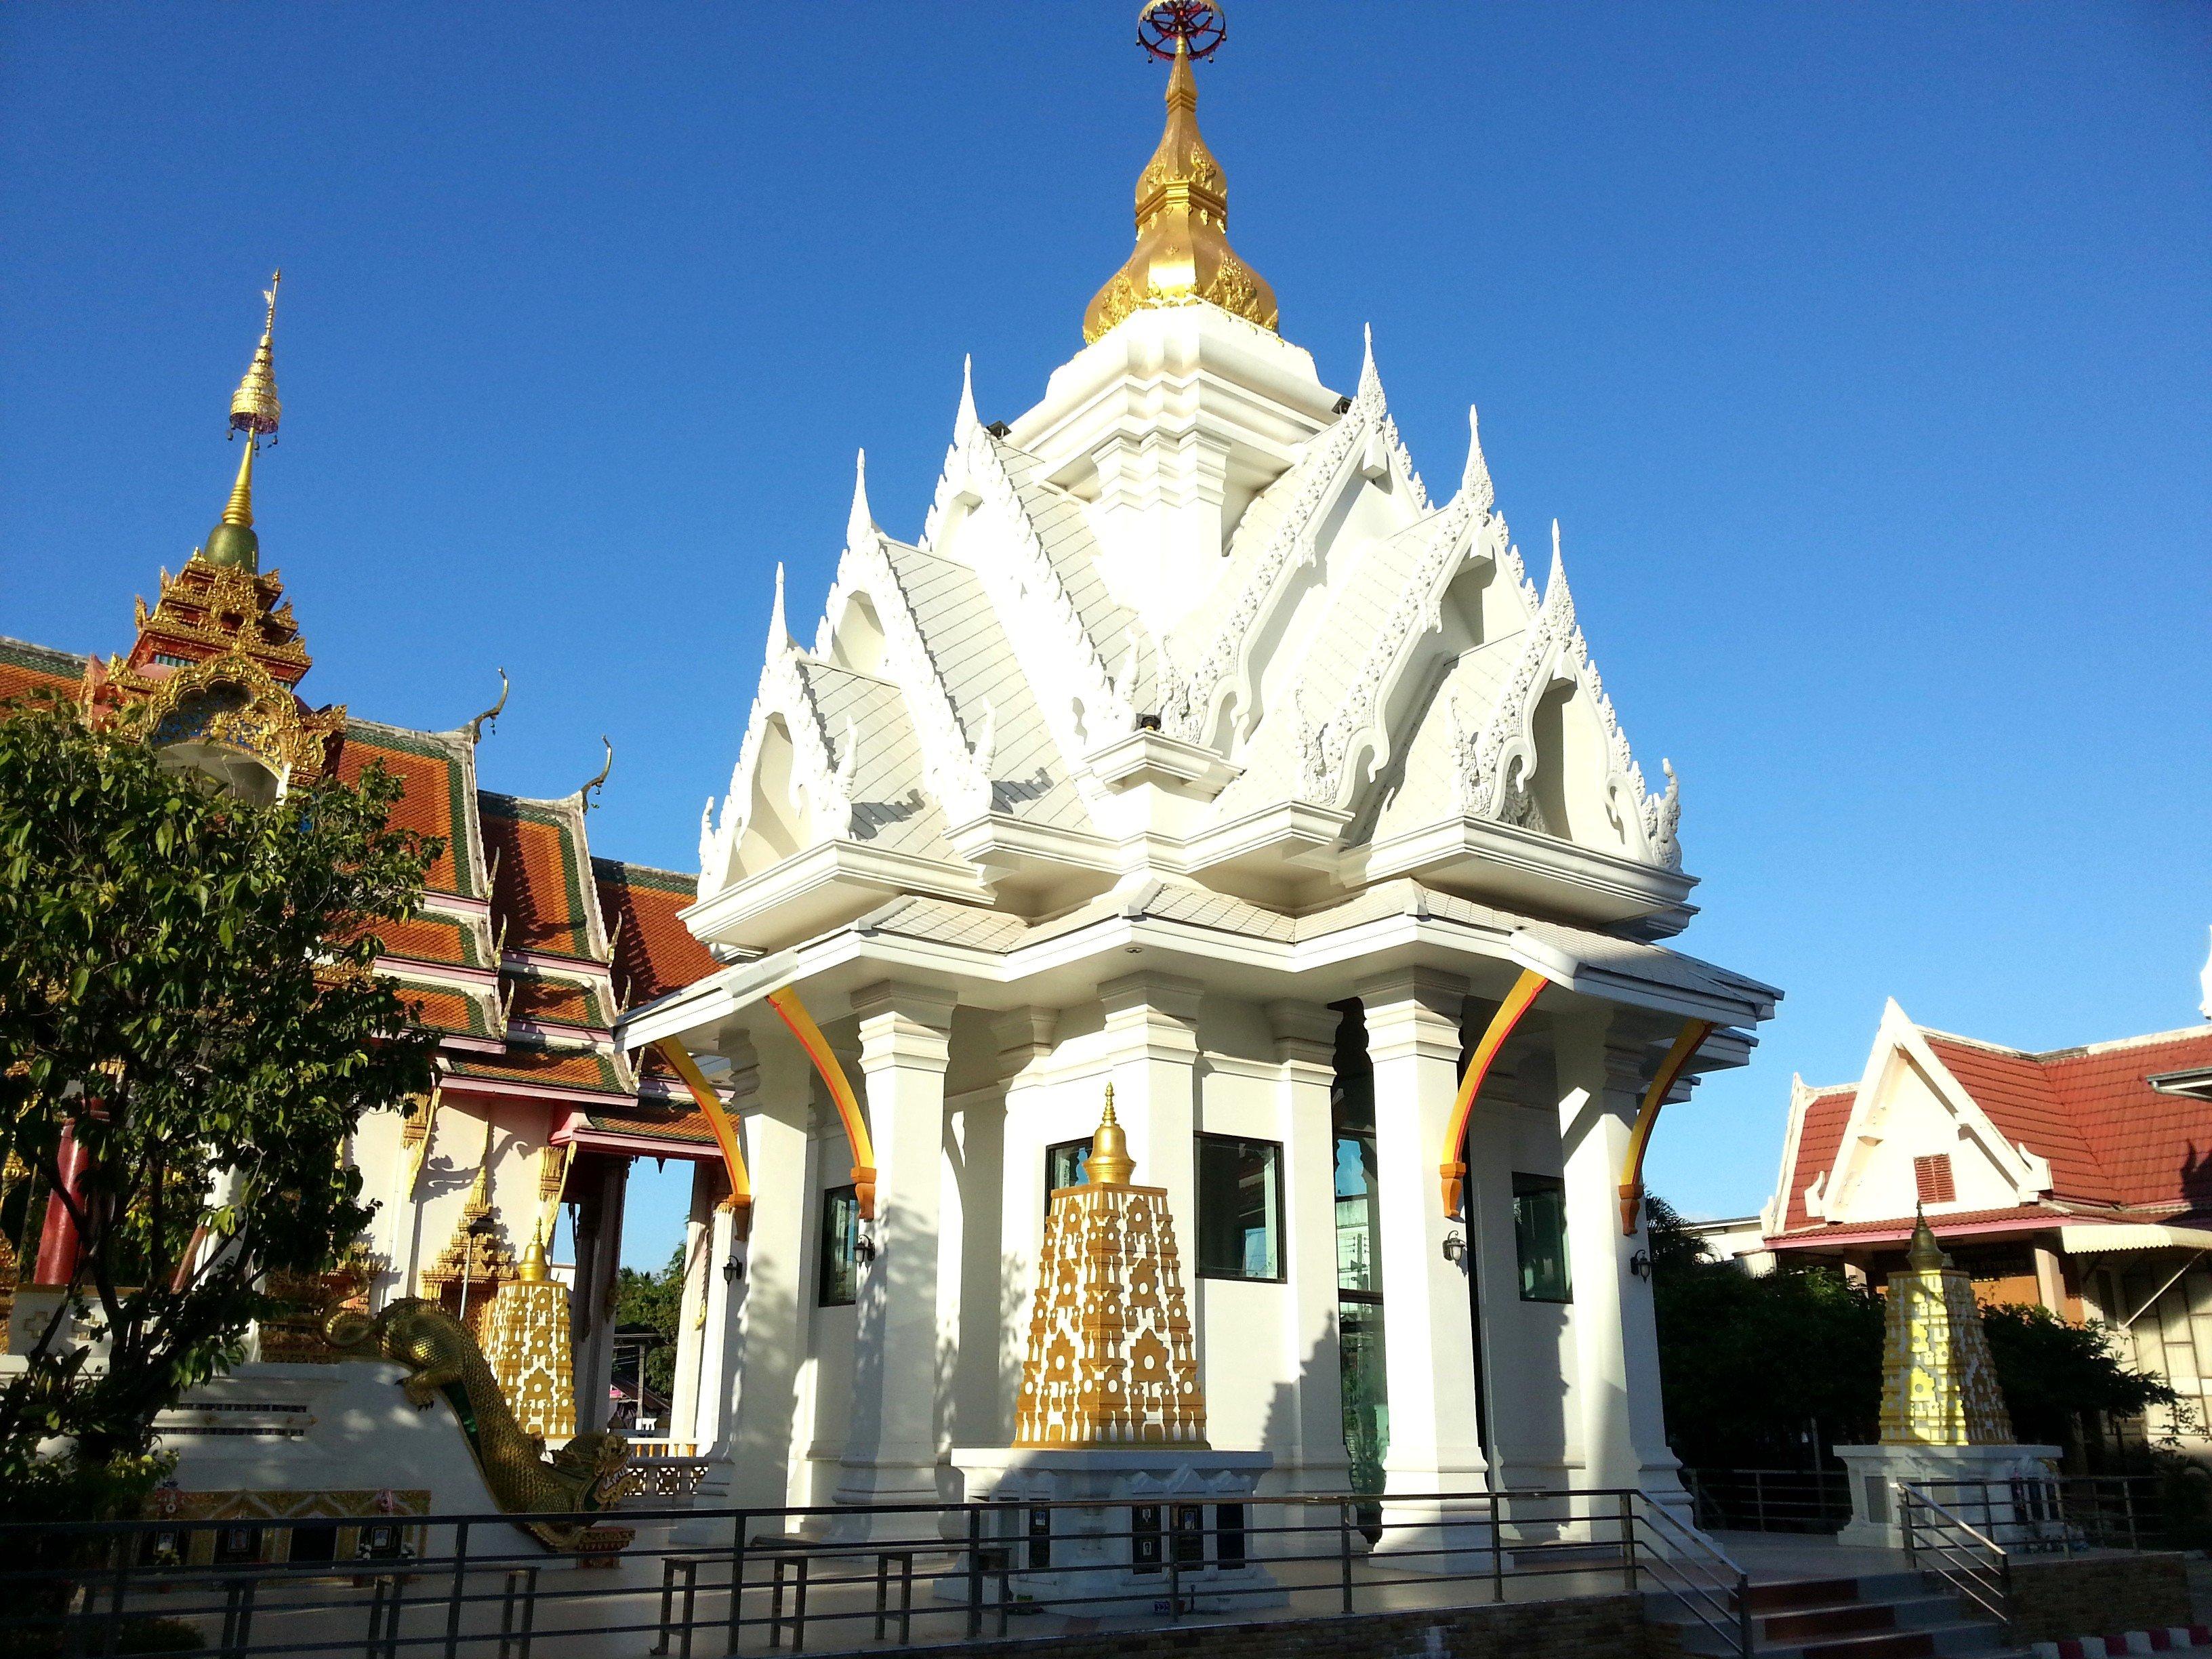 Stupa at Wat Chaeng Saeng Arun